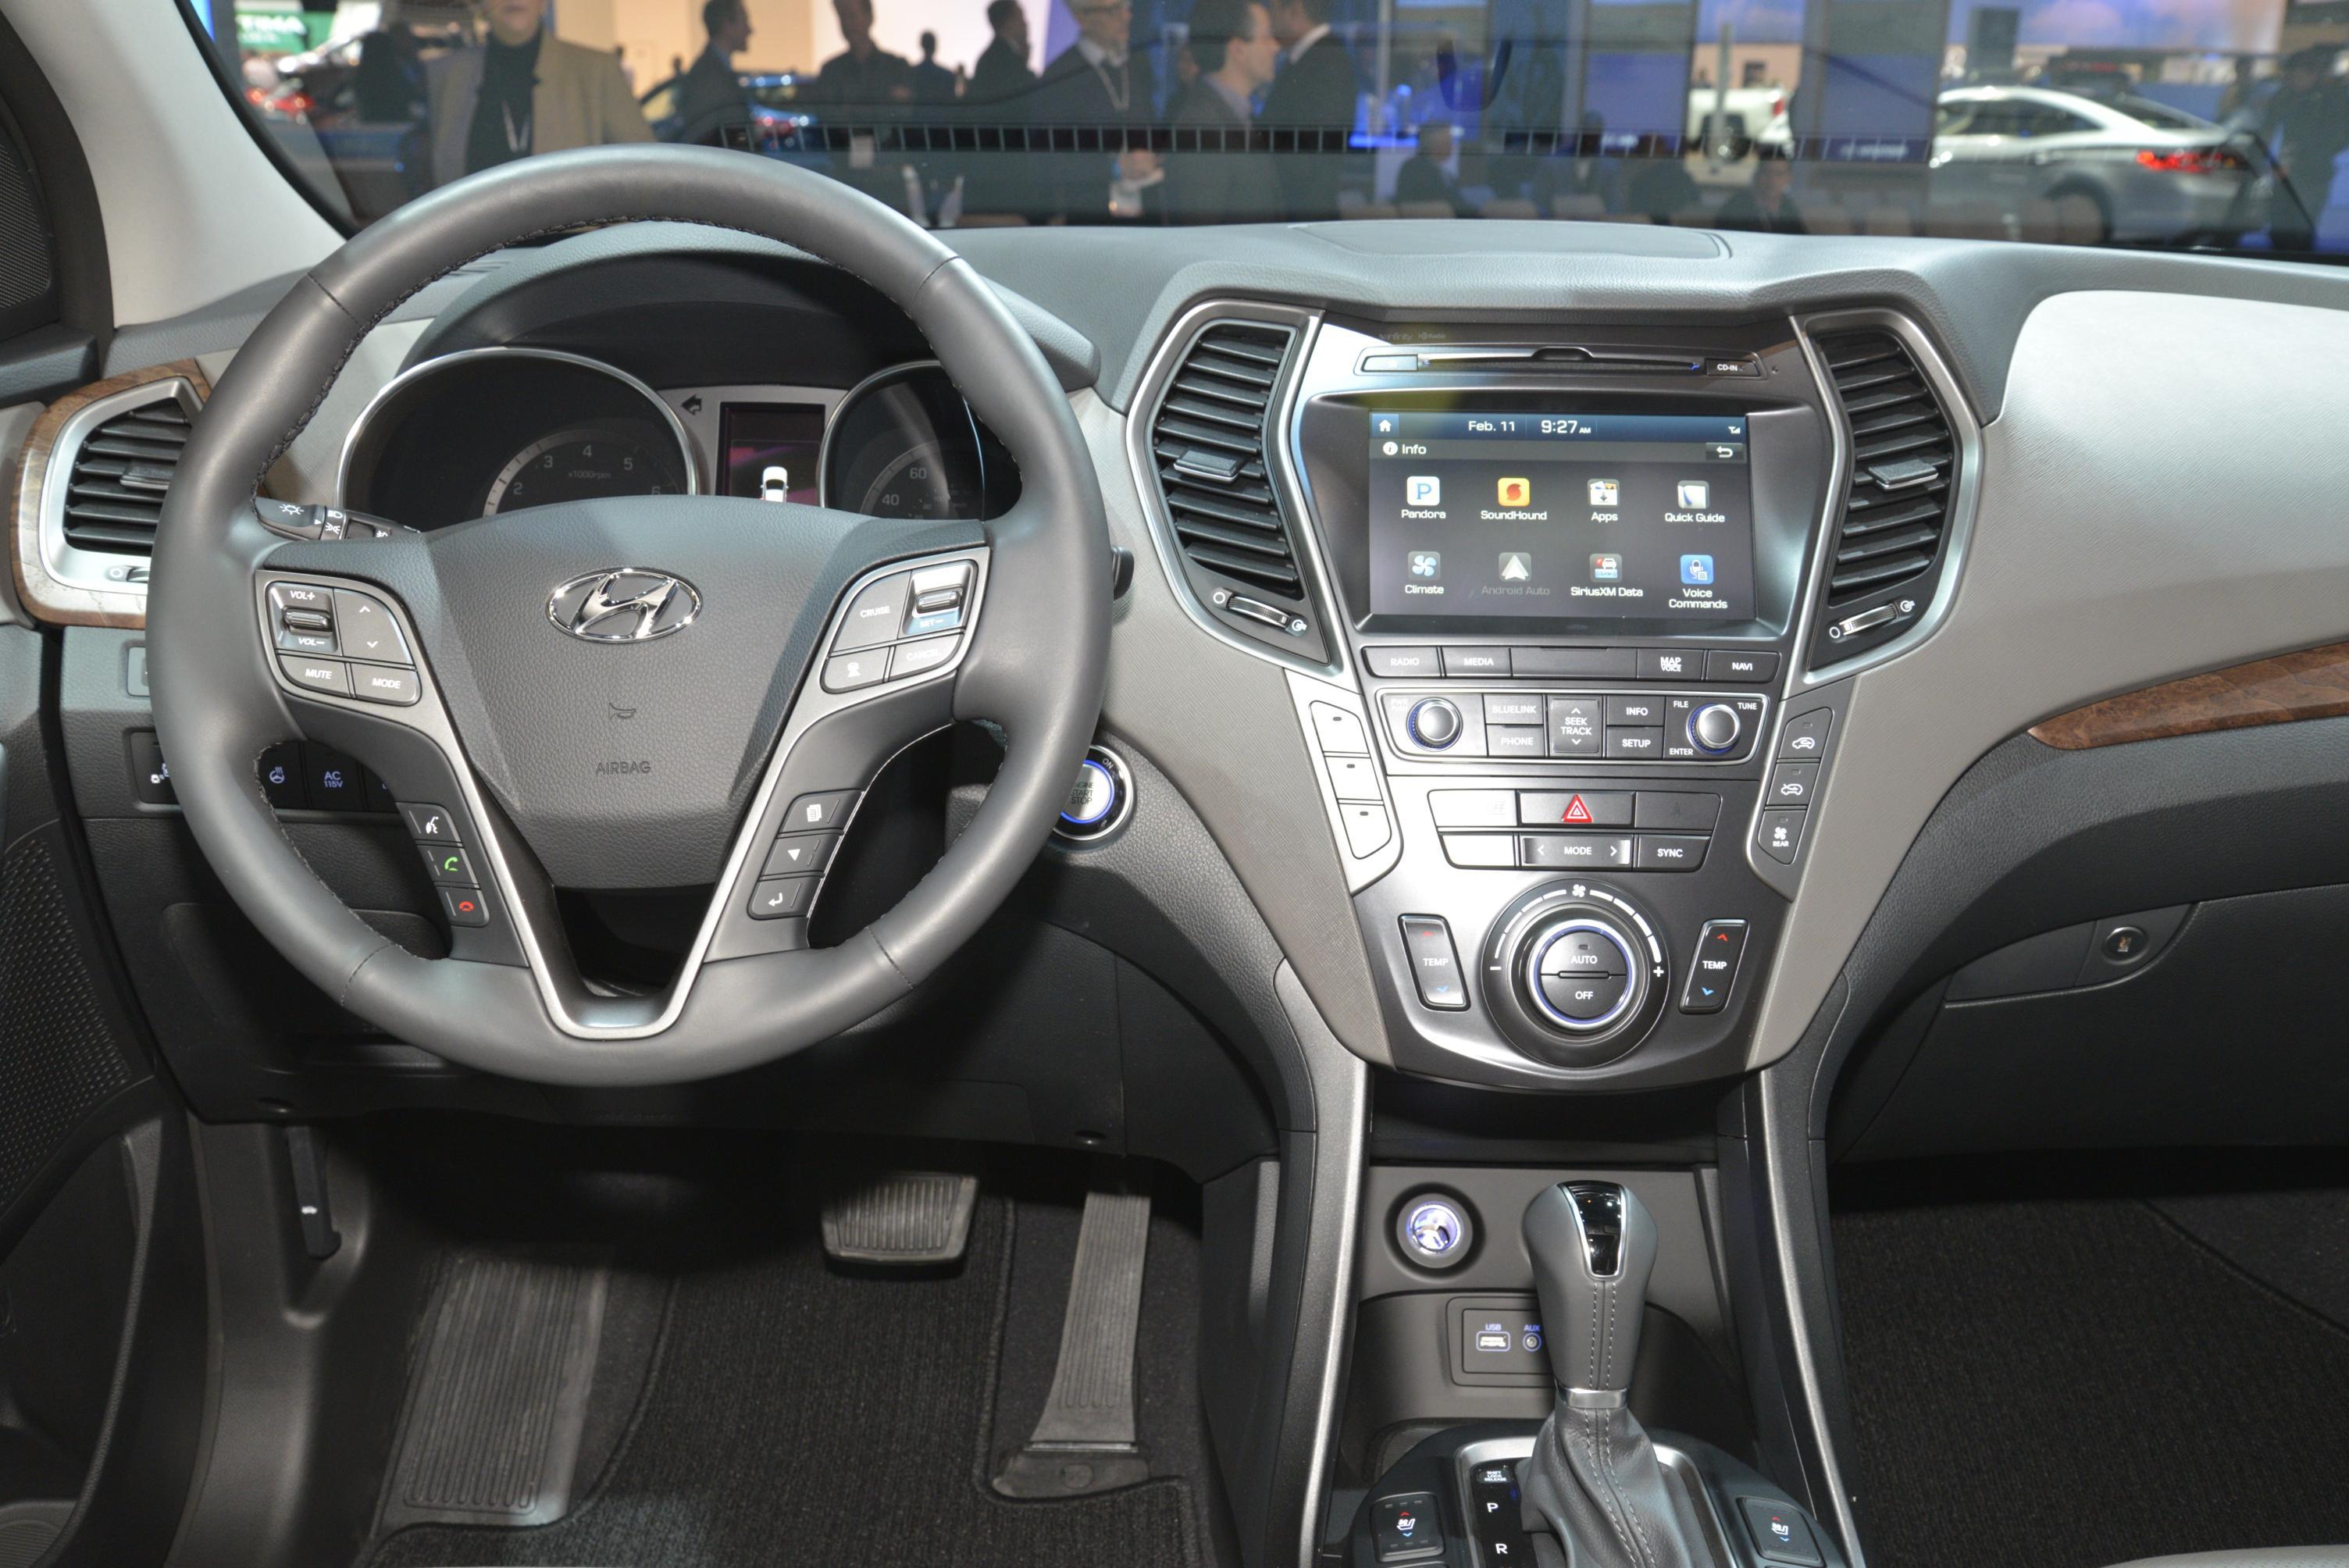 2017 Hyundai Santa Fe Thinks Its Got A Sexy Facelift In